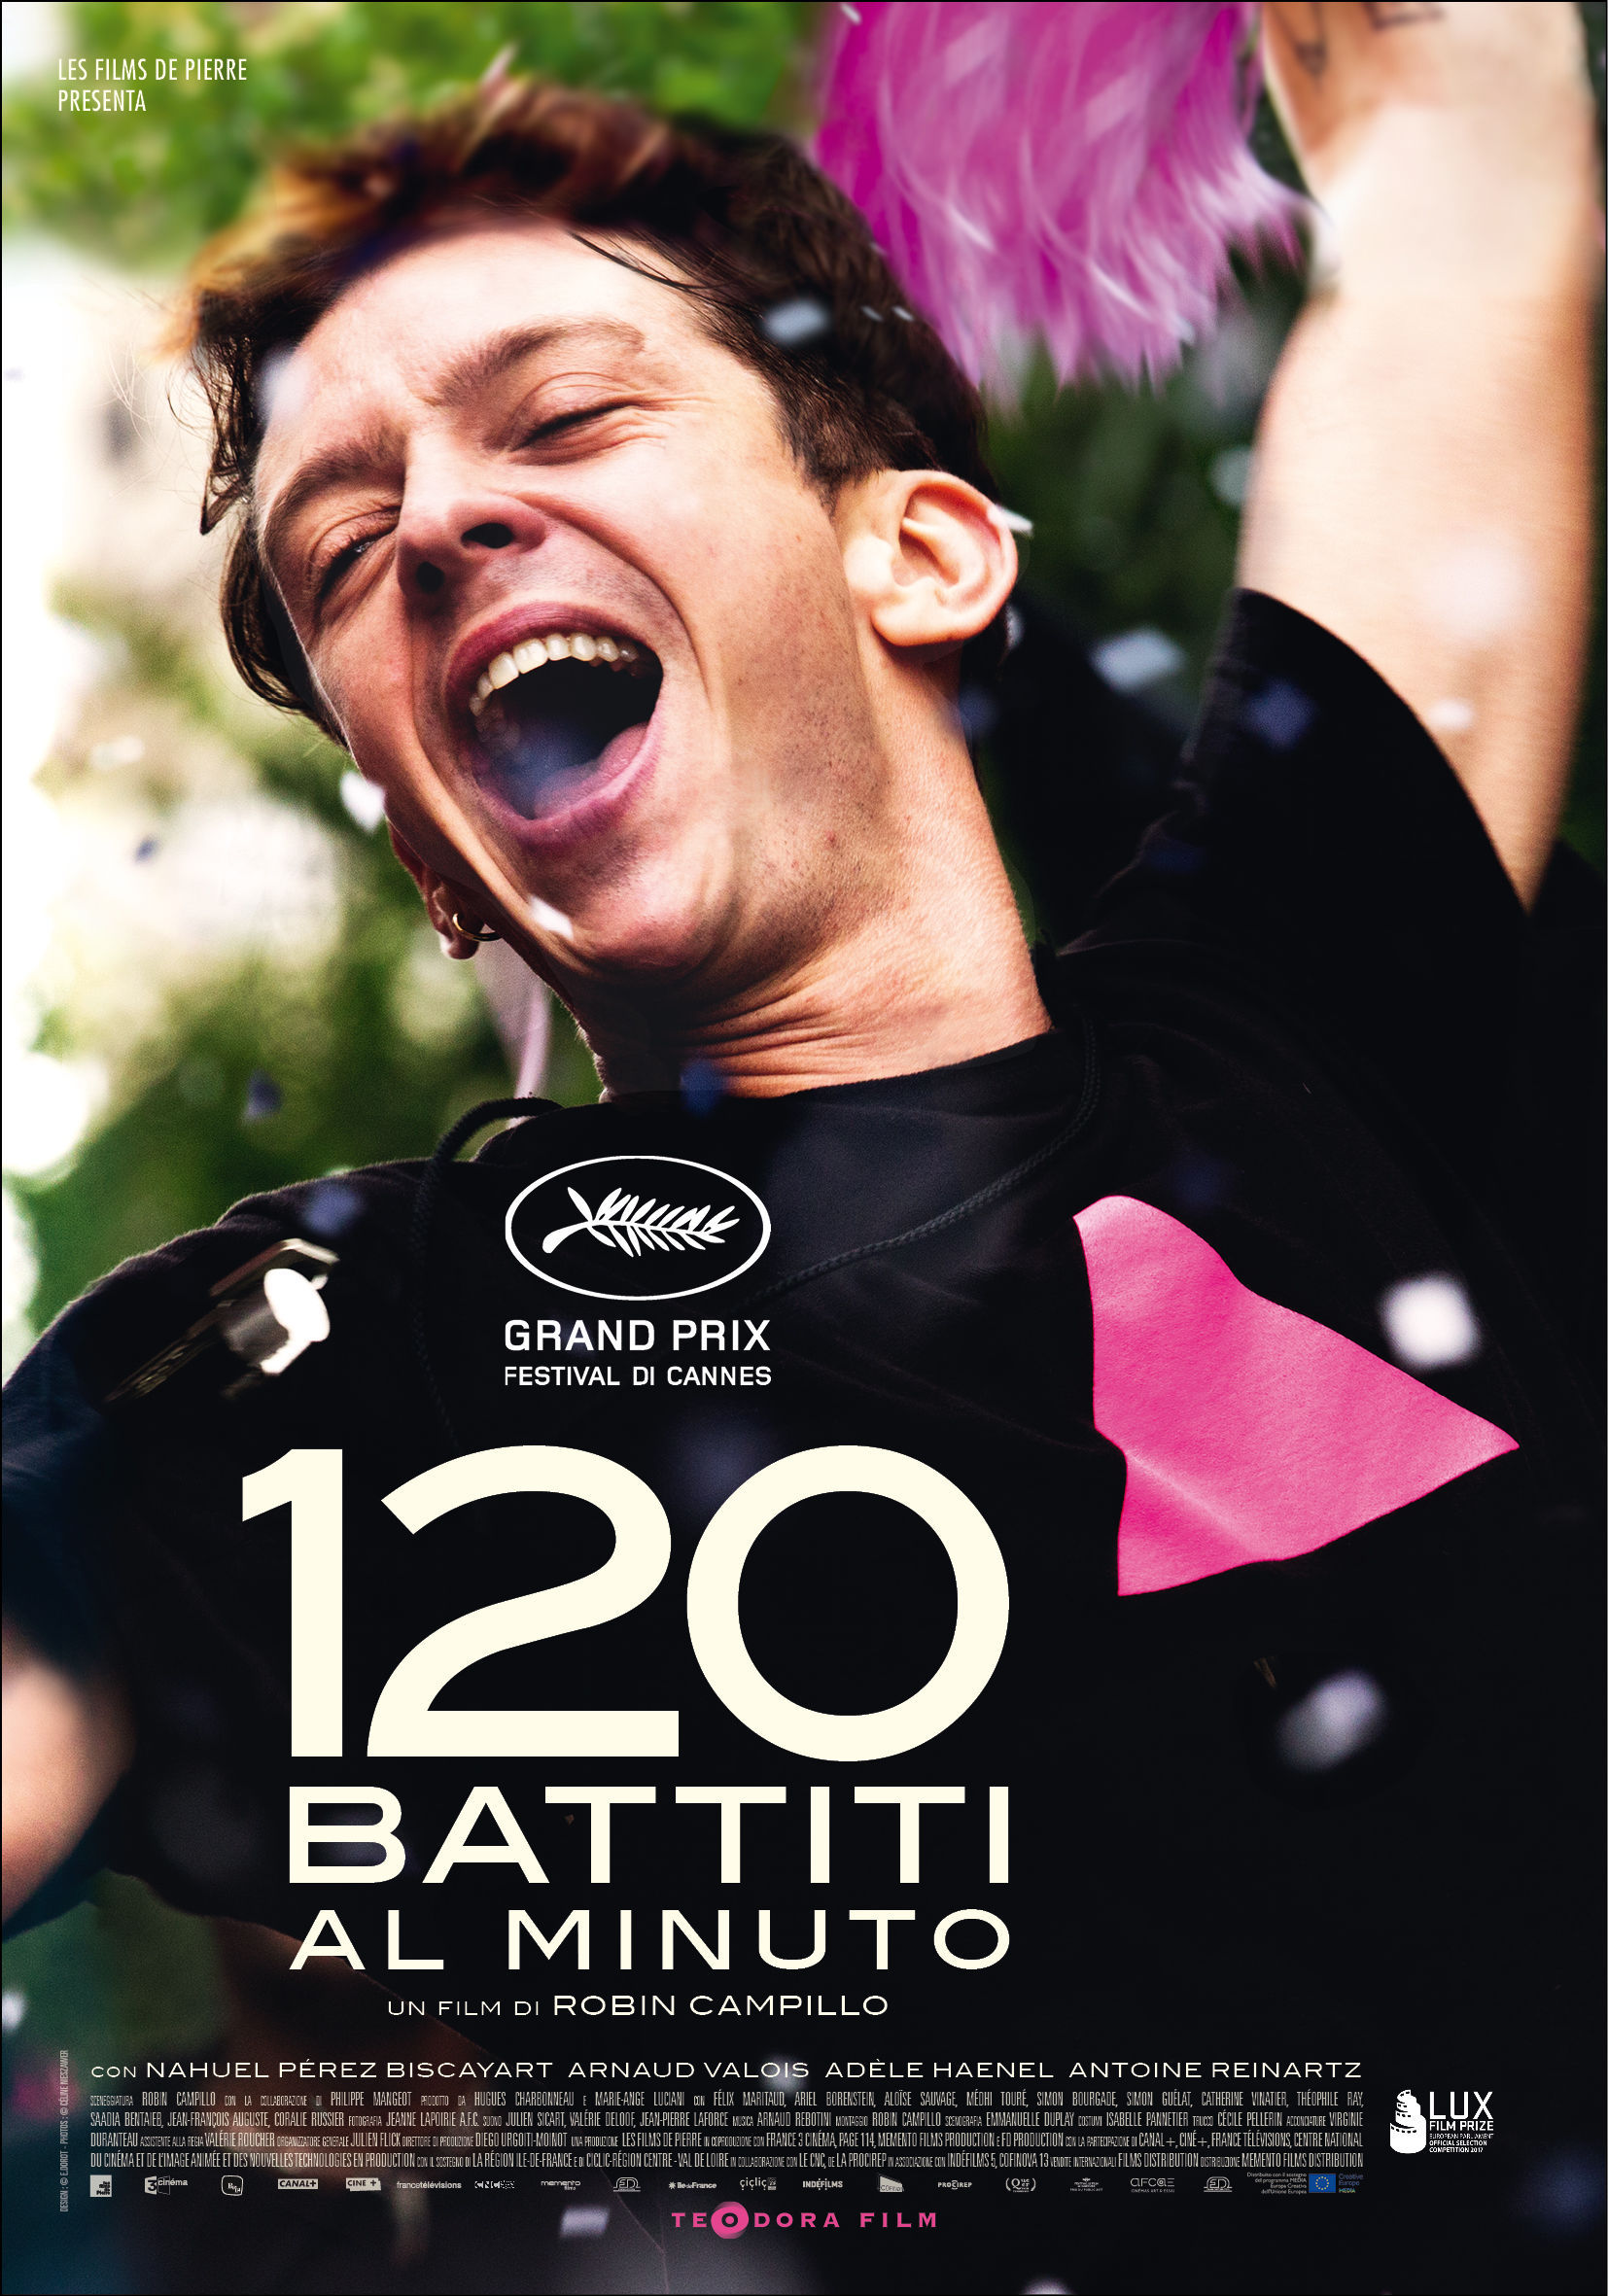 120 BATTITI AL MINUTO manifesto